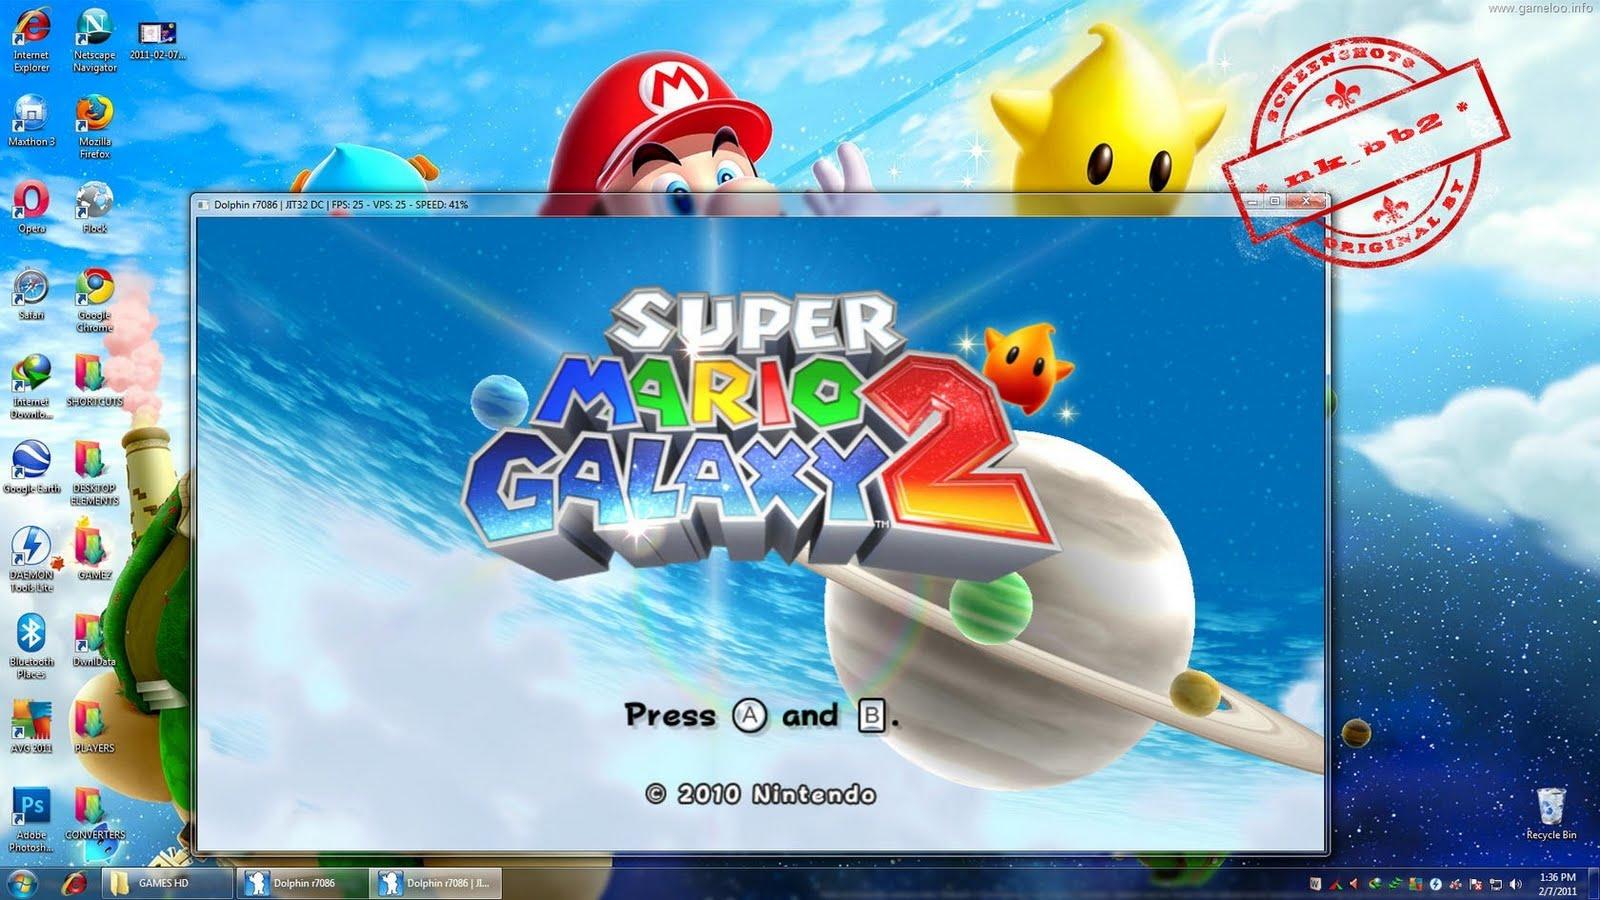 Super Mario Galaxy 2 Iso For Dolphin - softcorpsoftava